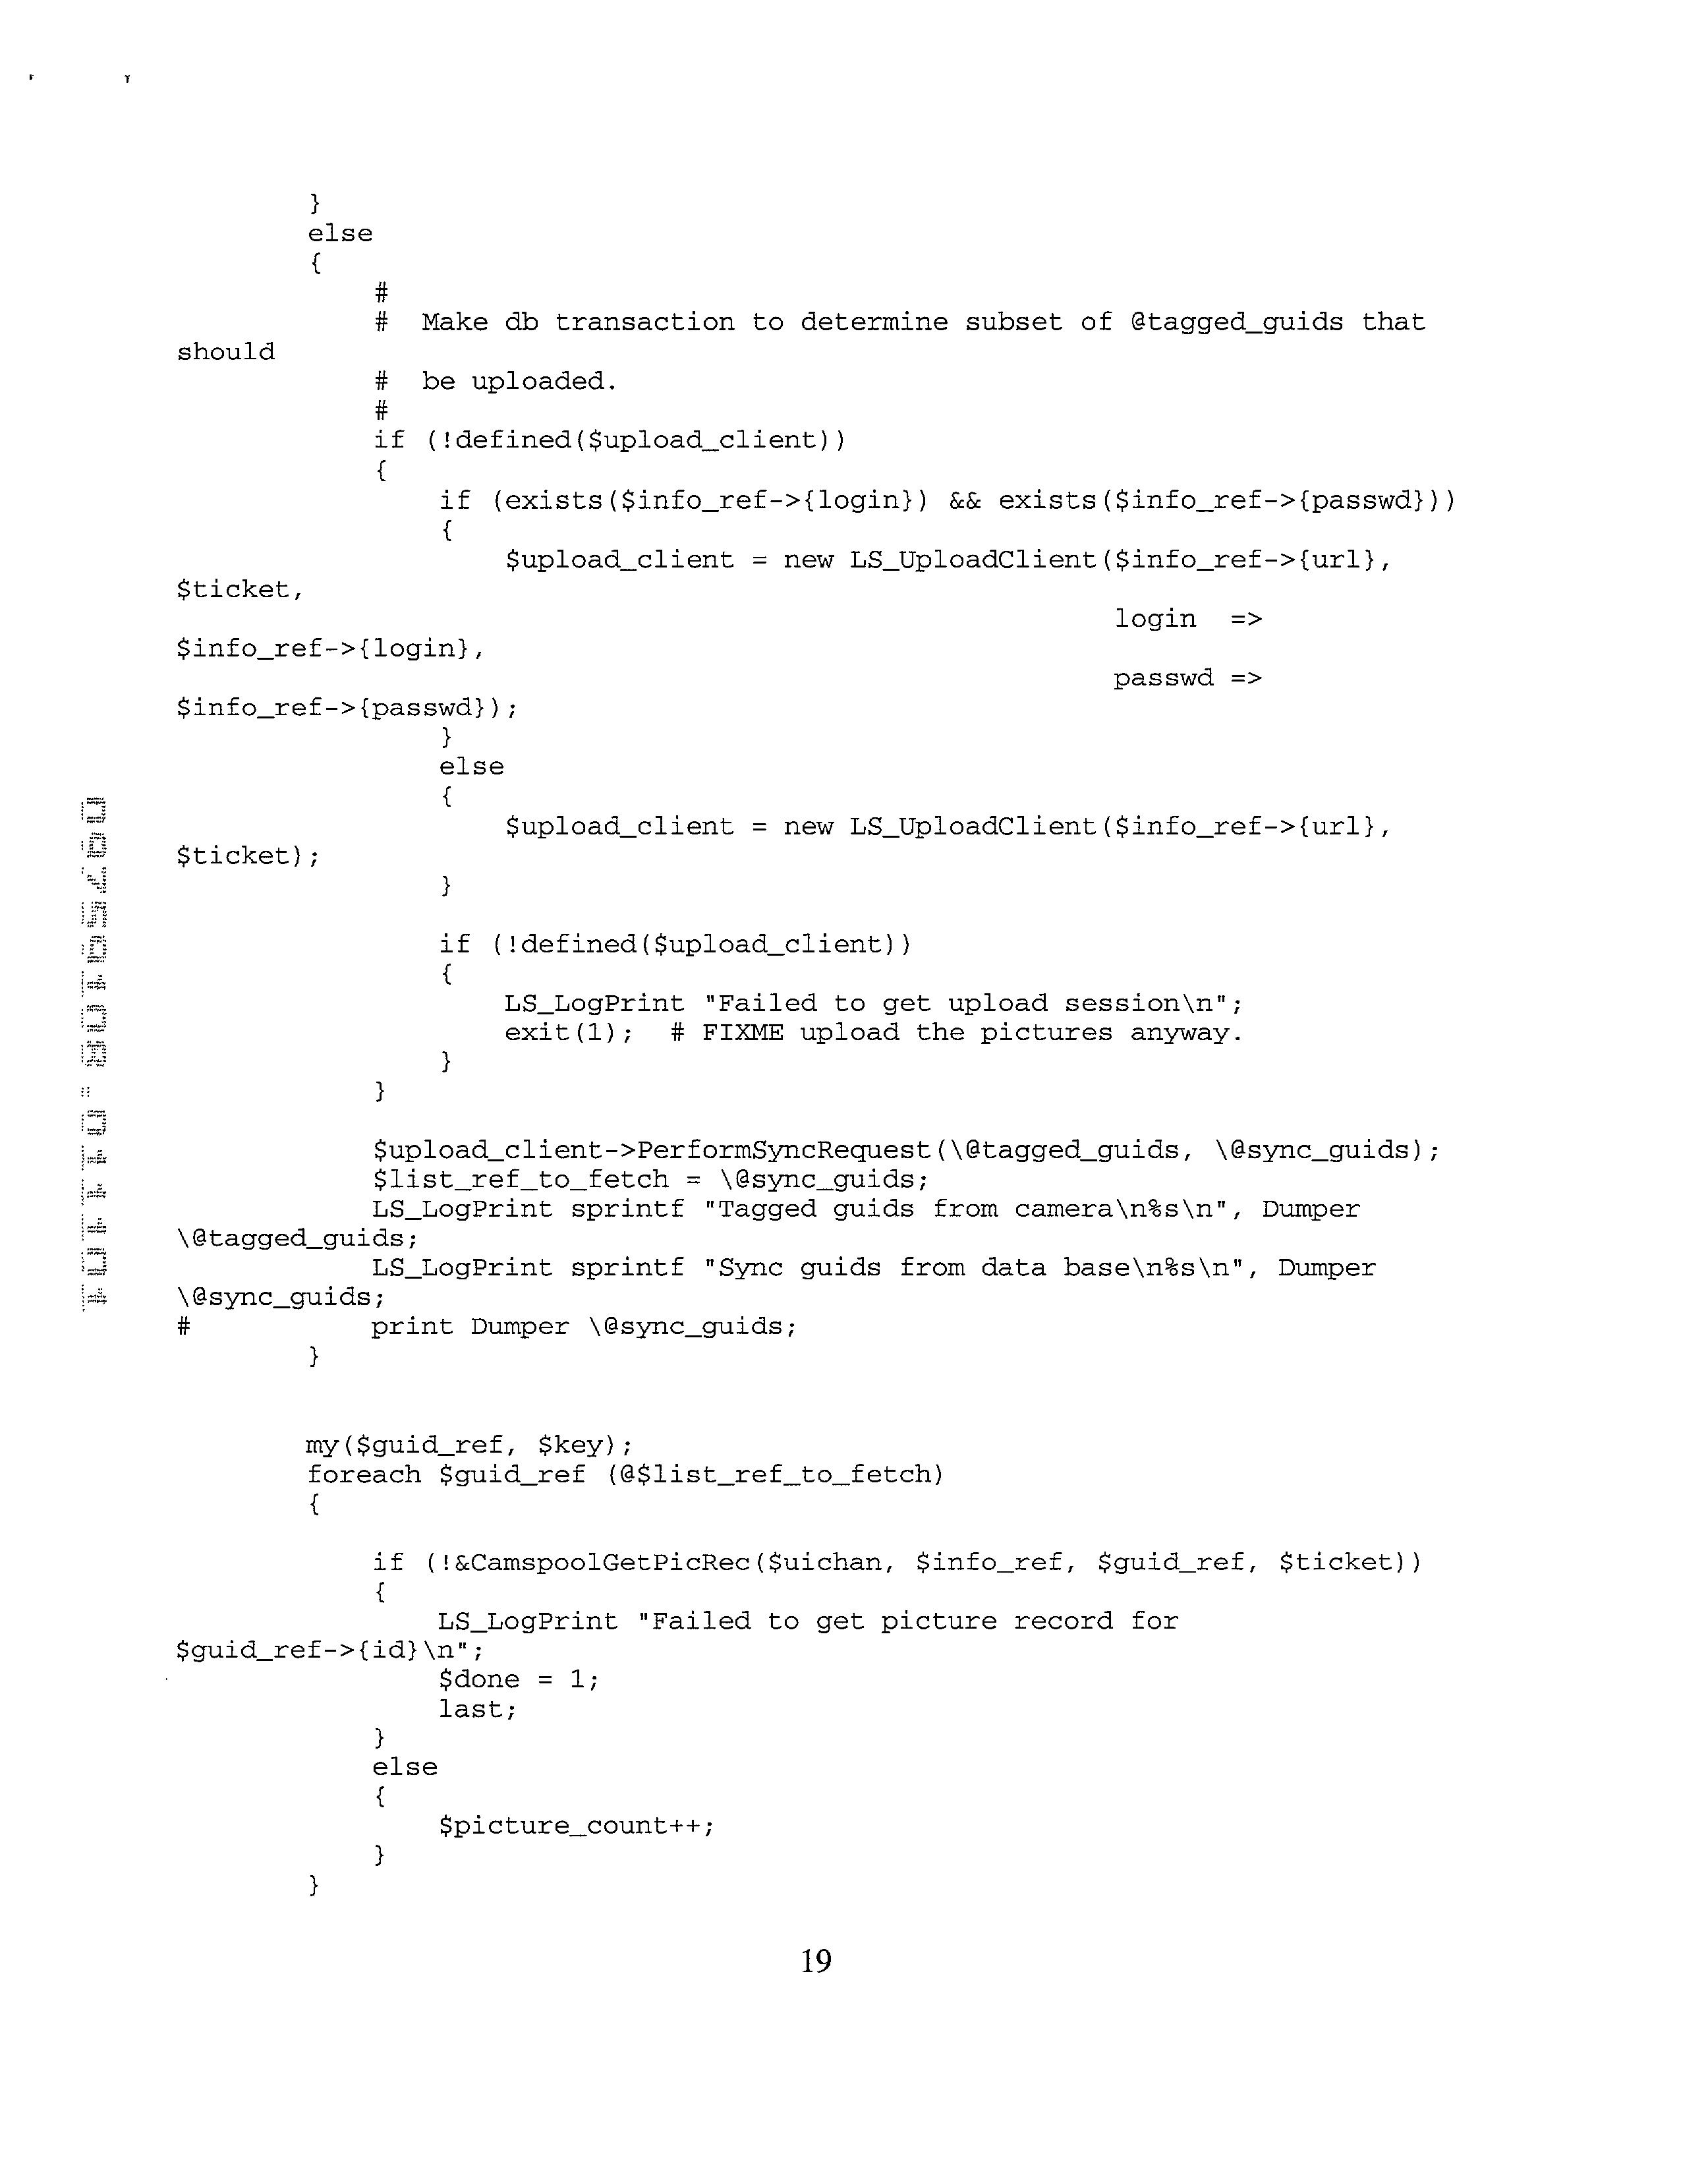 Interpolation search methodology